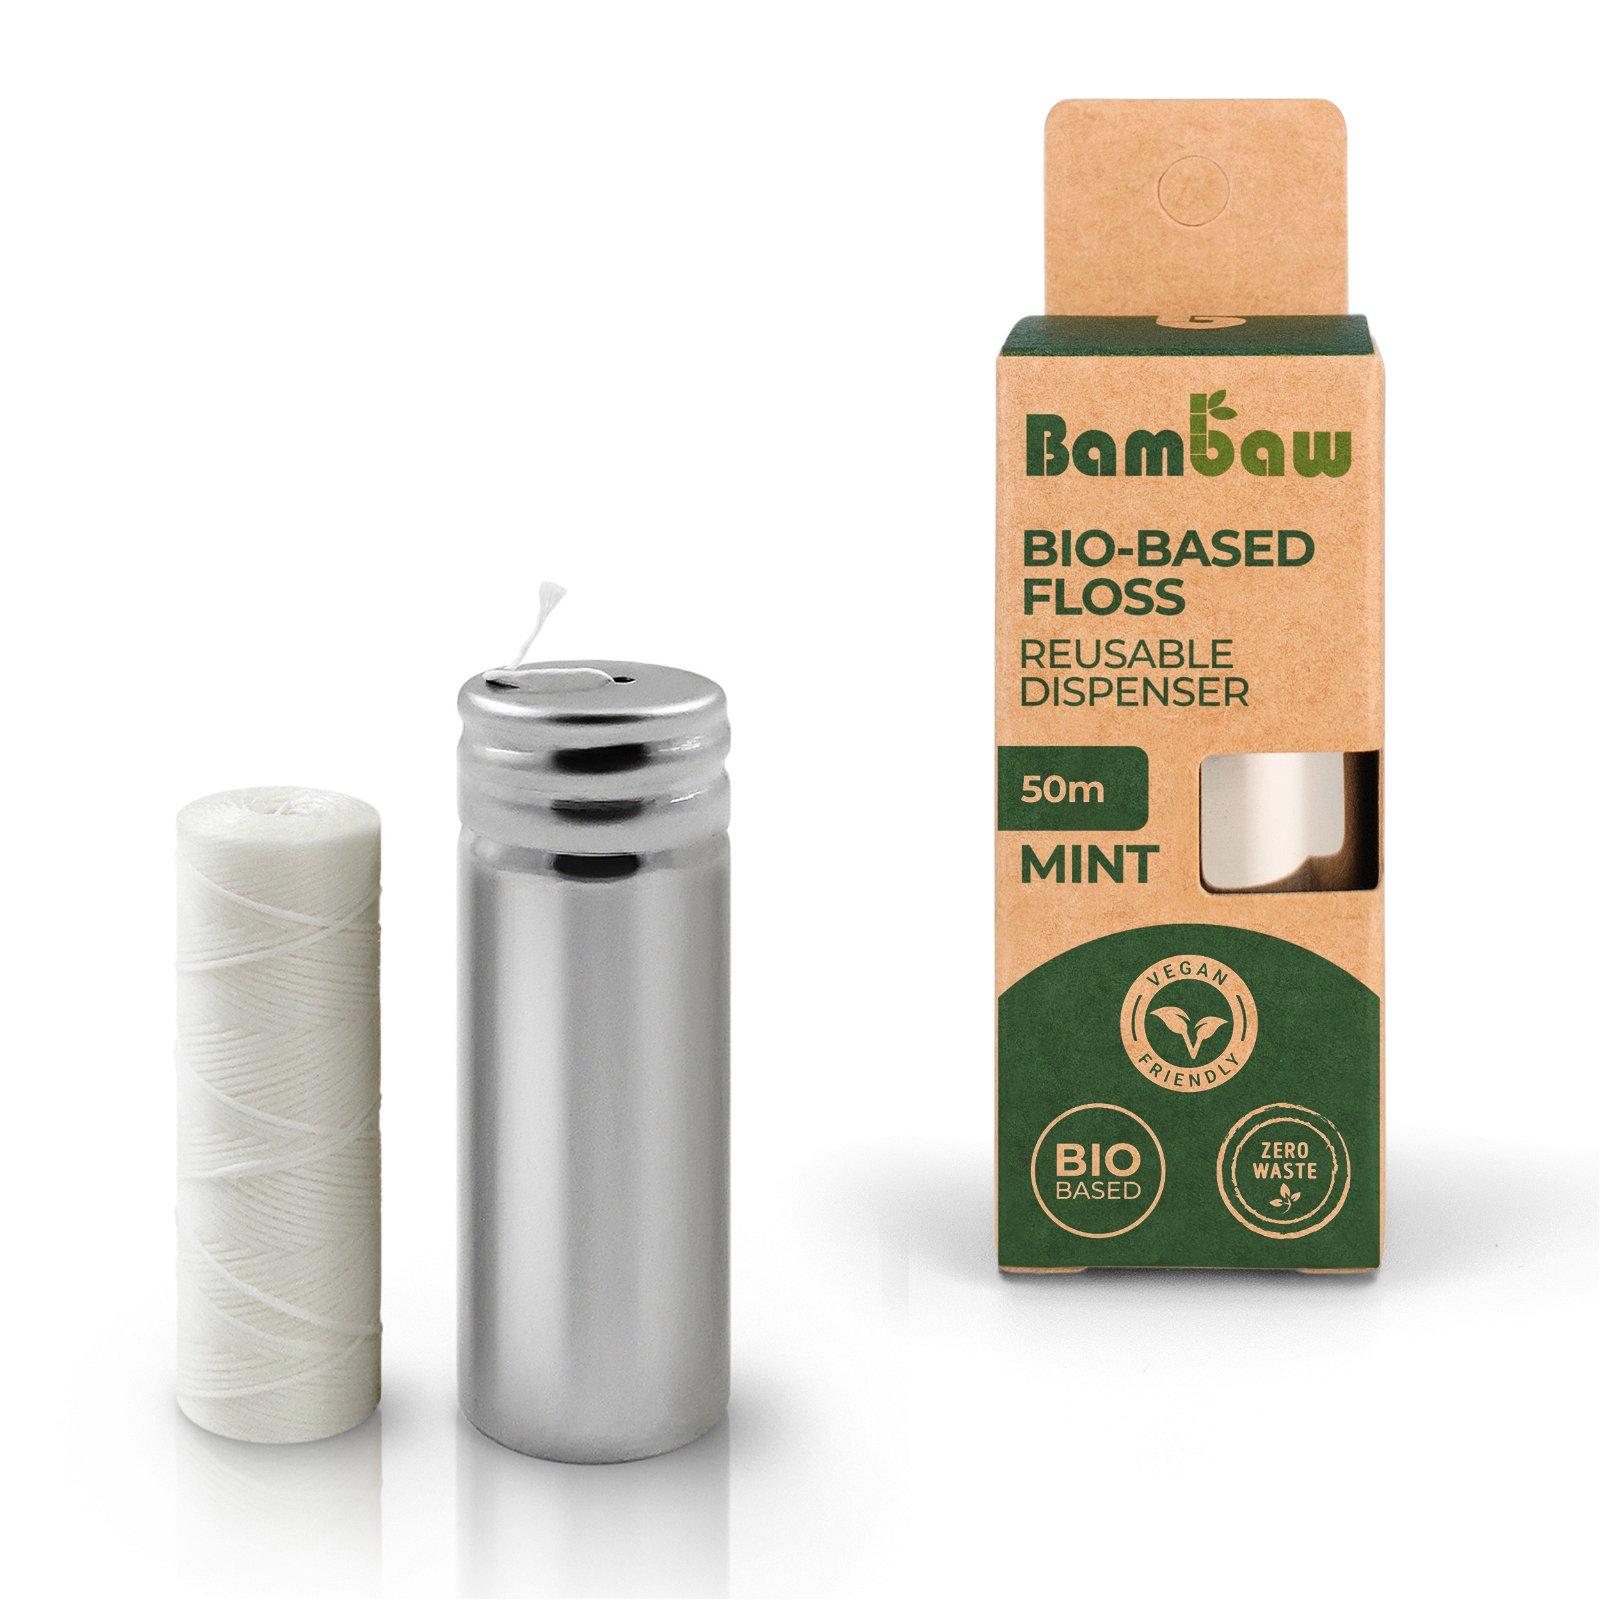 img-bambaw-distributeur-de-fil-dentaire-recharge-en-pla-zero-dechet